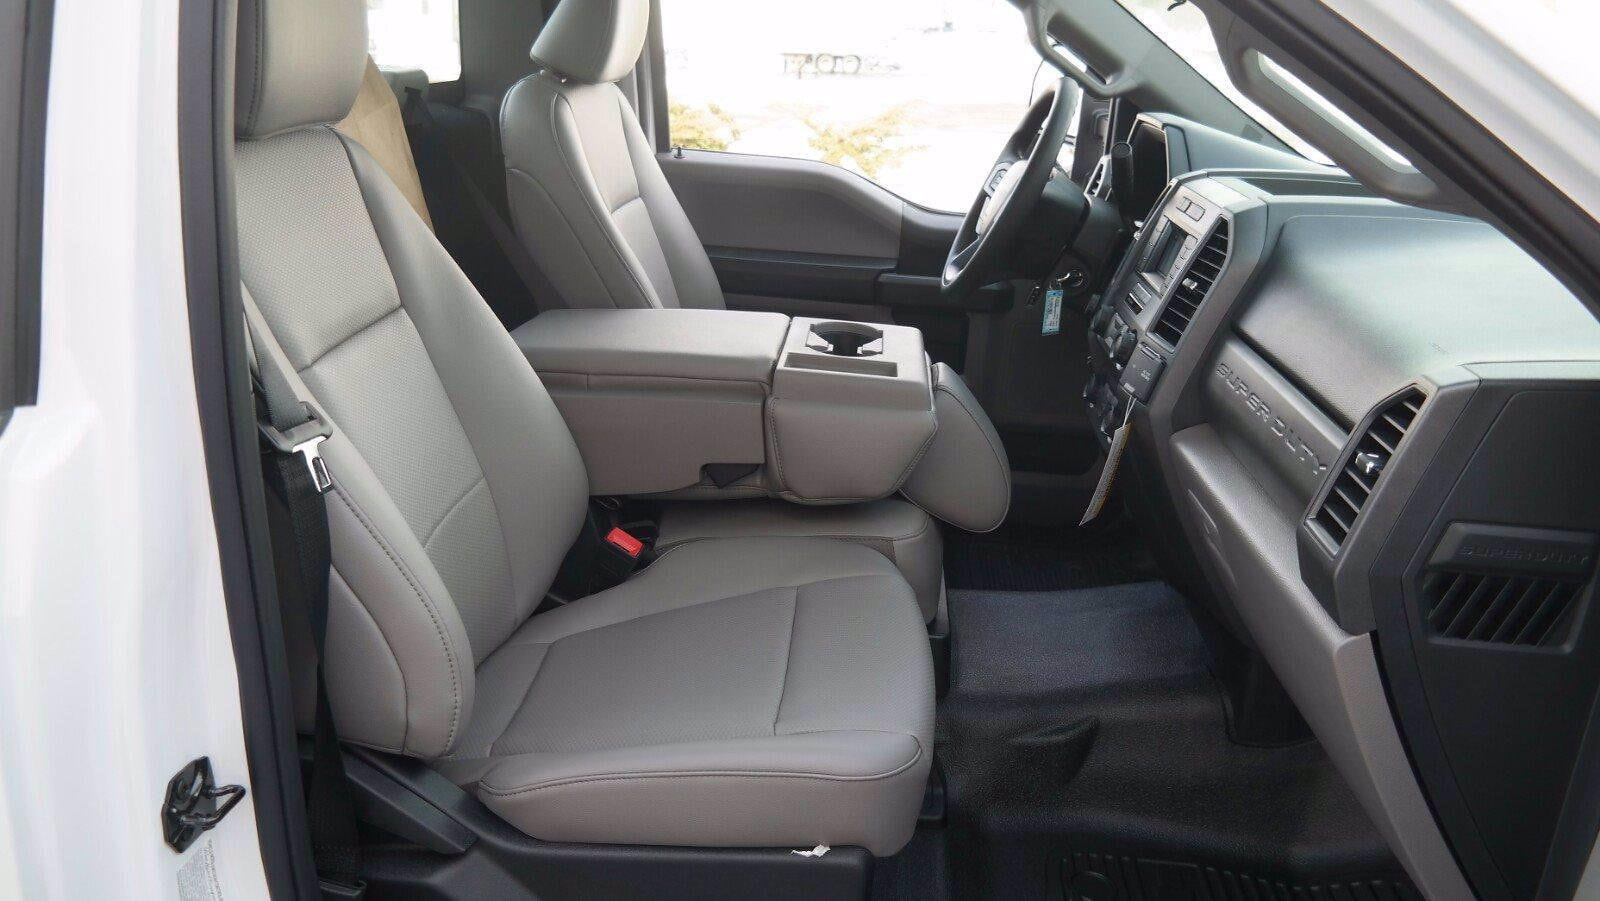 2021 Ford F-600 Regular Cab DRW 4x4, Cab Chassis #FLU10034 - photo 16